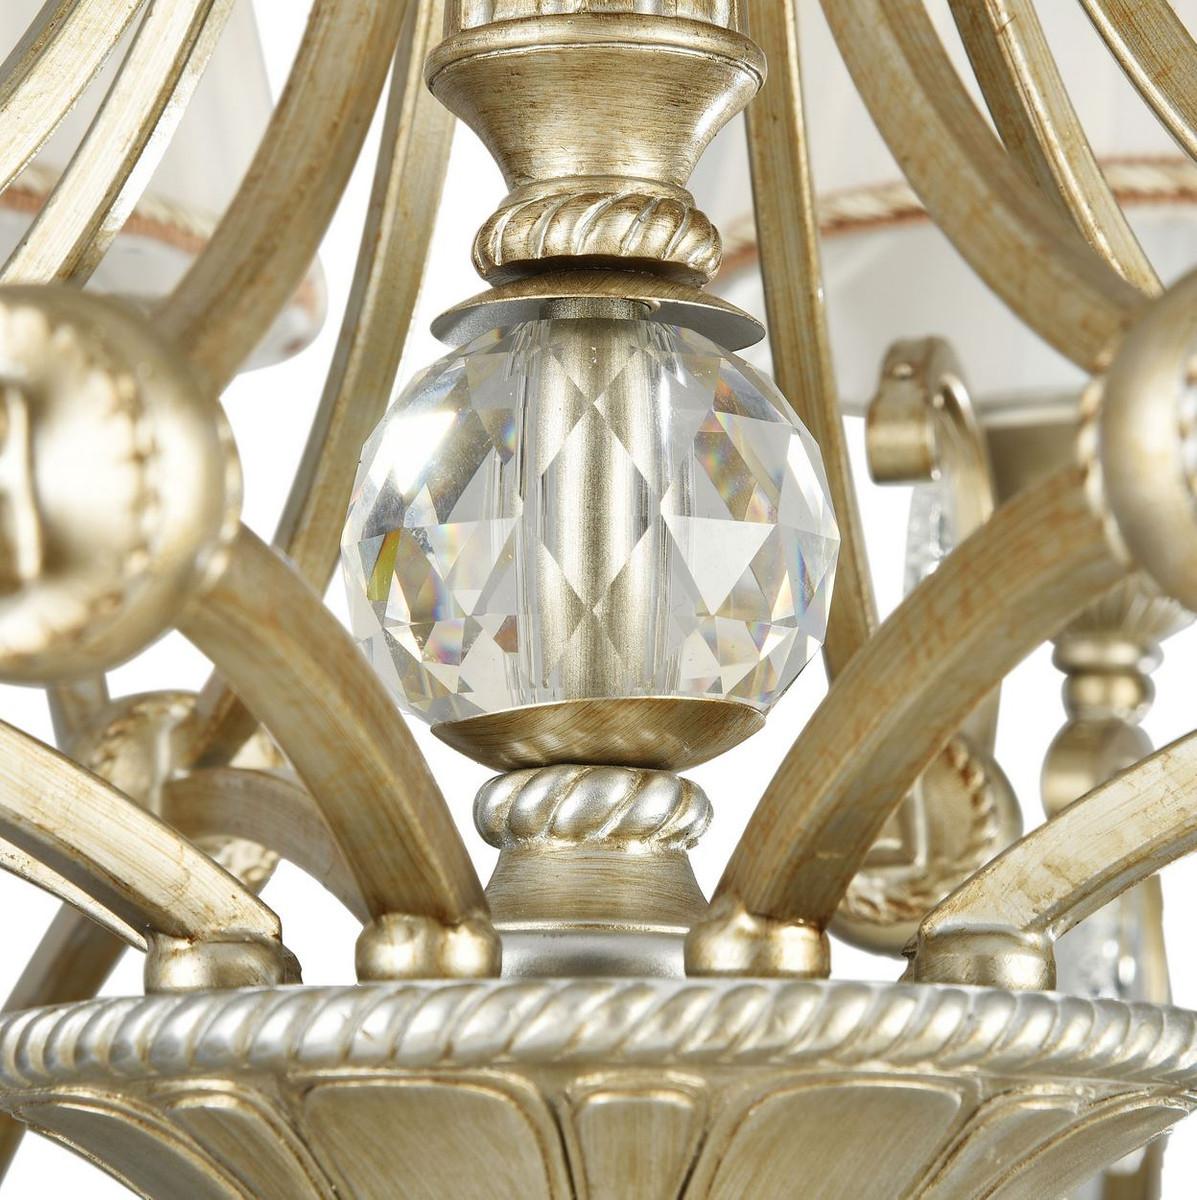 Casa Padrino Barock Kronleuchter 8-Flammig Gold / Silber Ø 80 x H. 50 cm - Barockstil Möbel 6